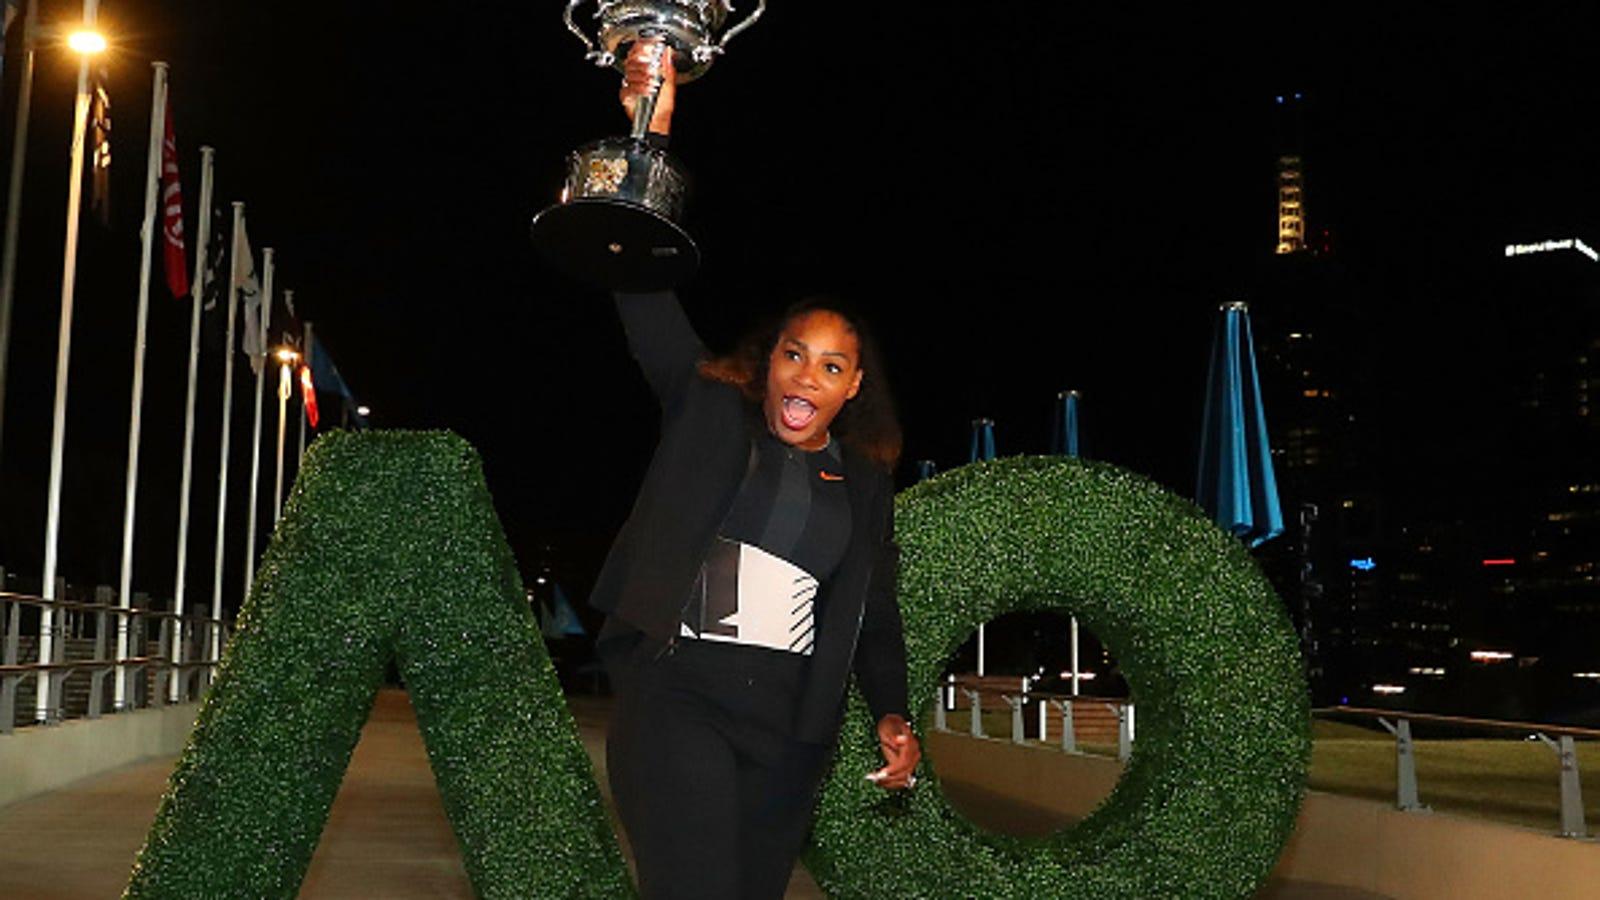 ef4a24d12b0 Serena Williams Rocks No. 23 Jordans—Sent by Michael Jordan—to Celebrate  Her 23rd Grand-Slam Win